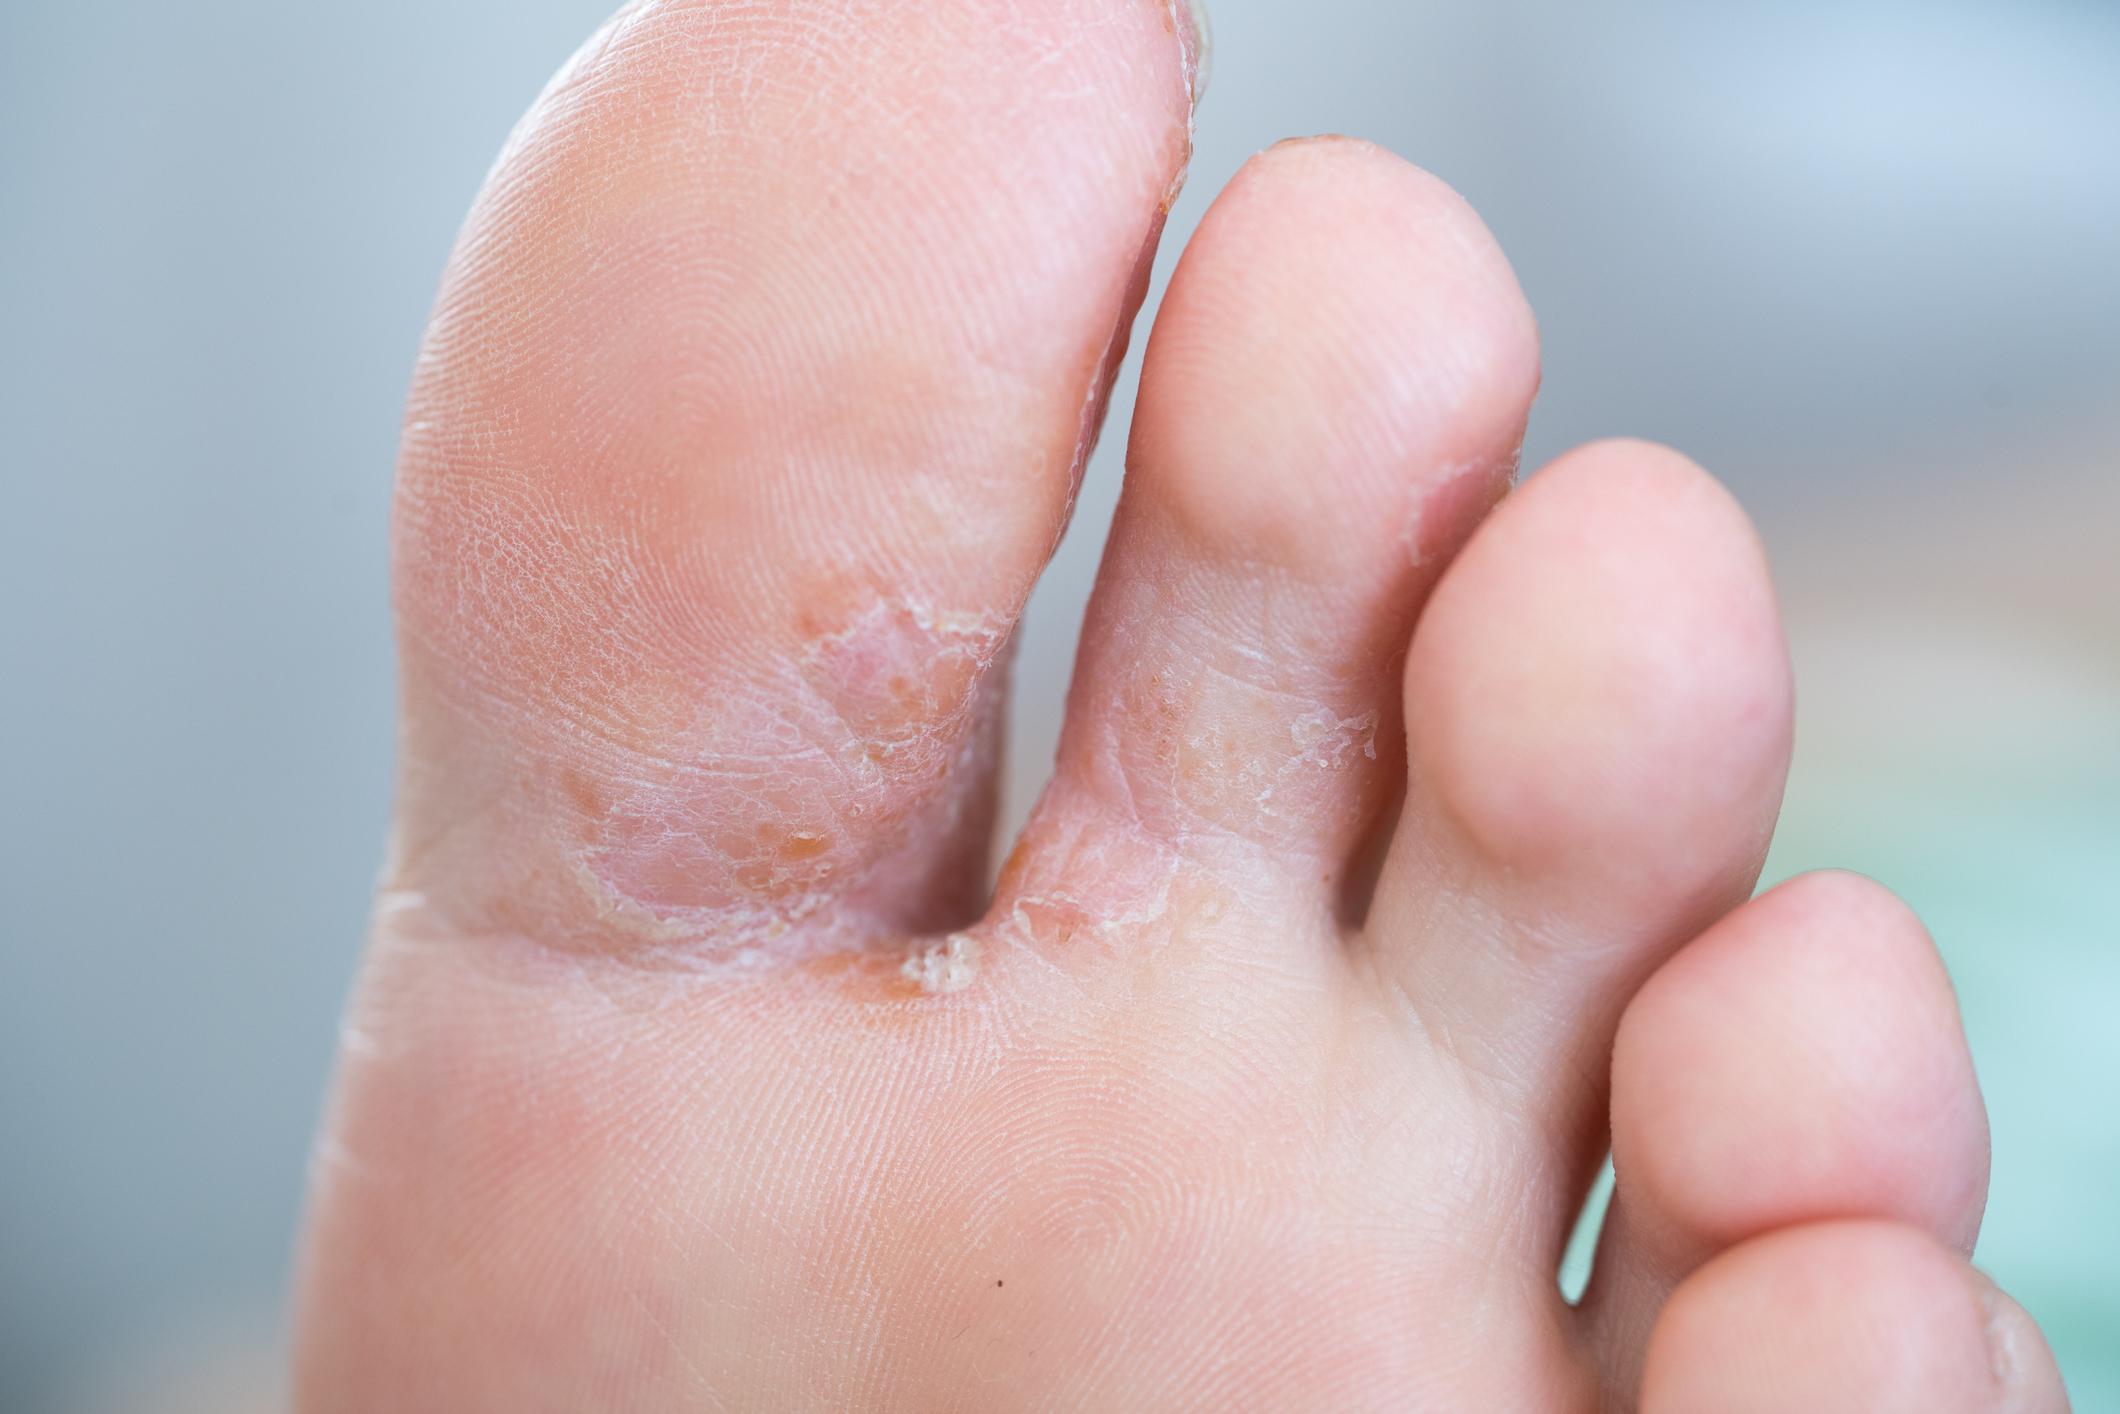 athletes foot image